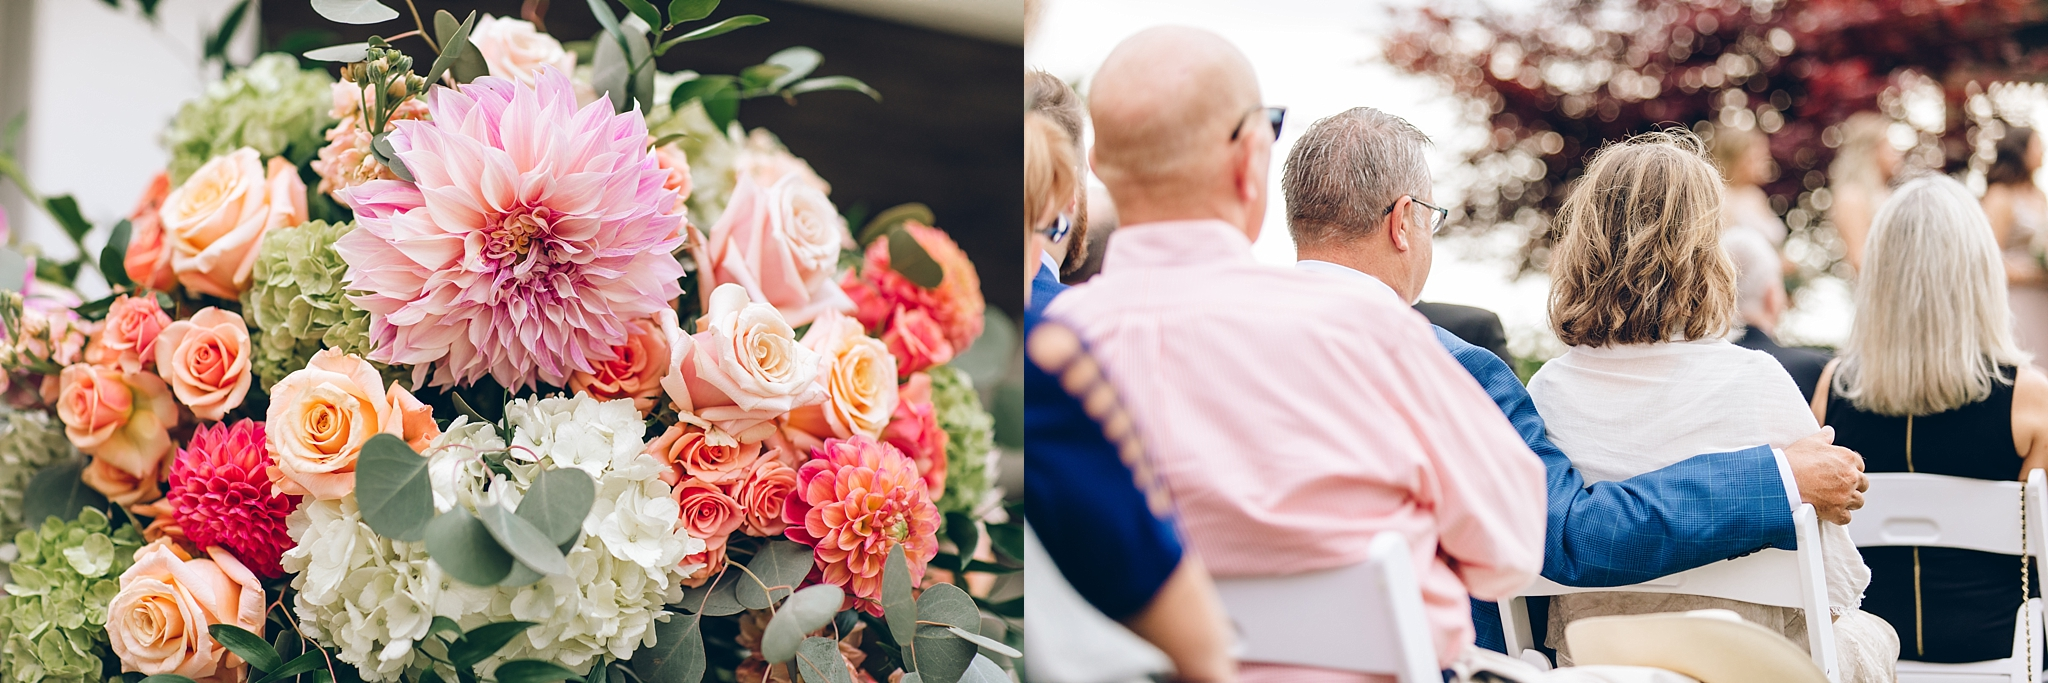 baker-lofts-holland-michigan-wedding-photographer_0357.jpg